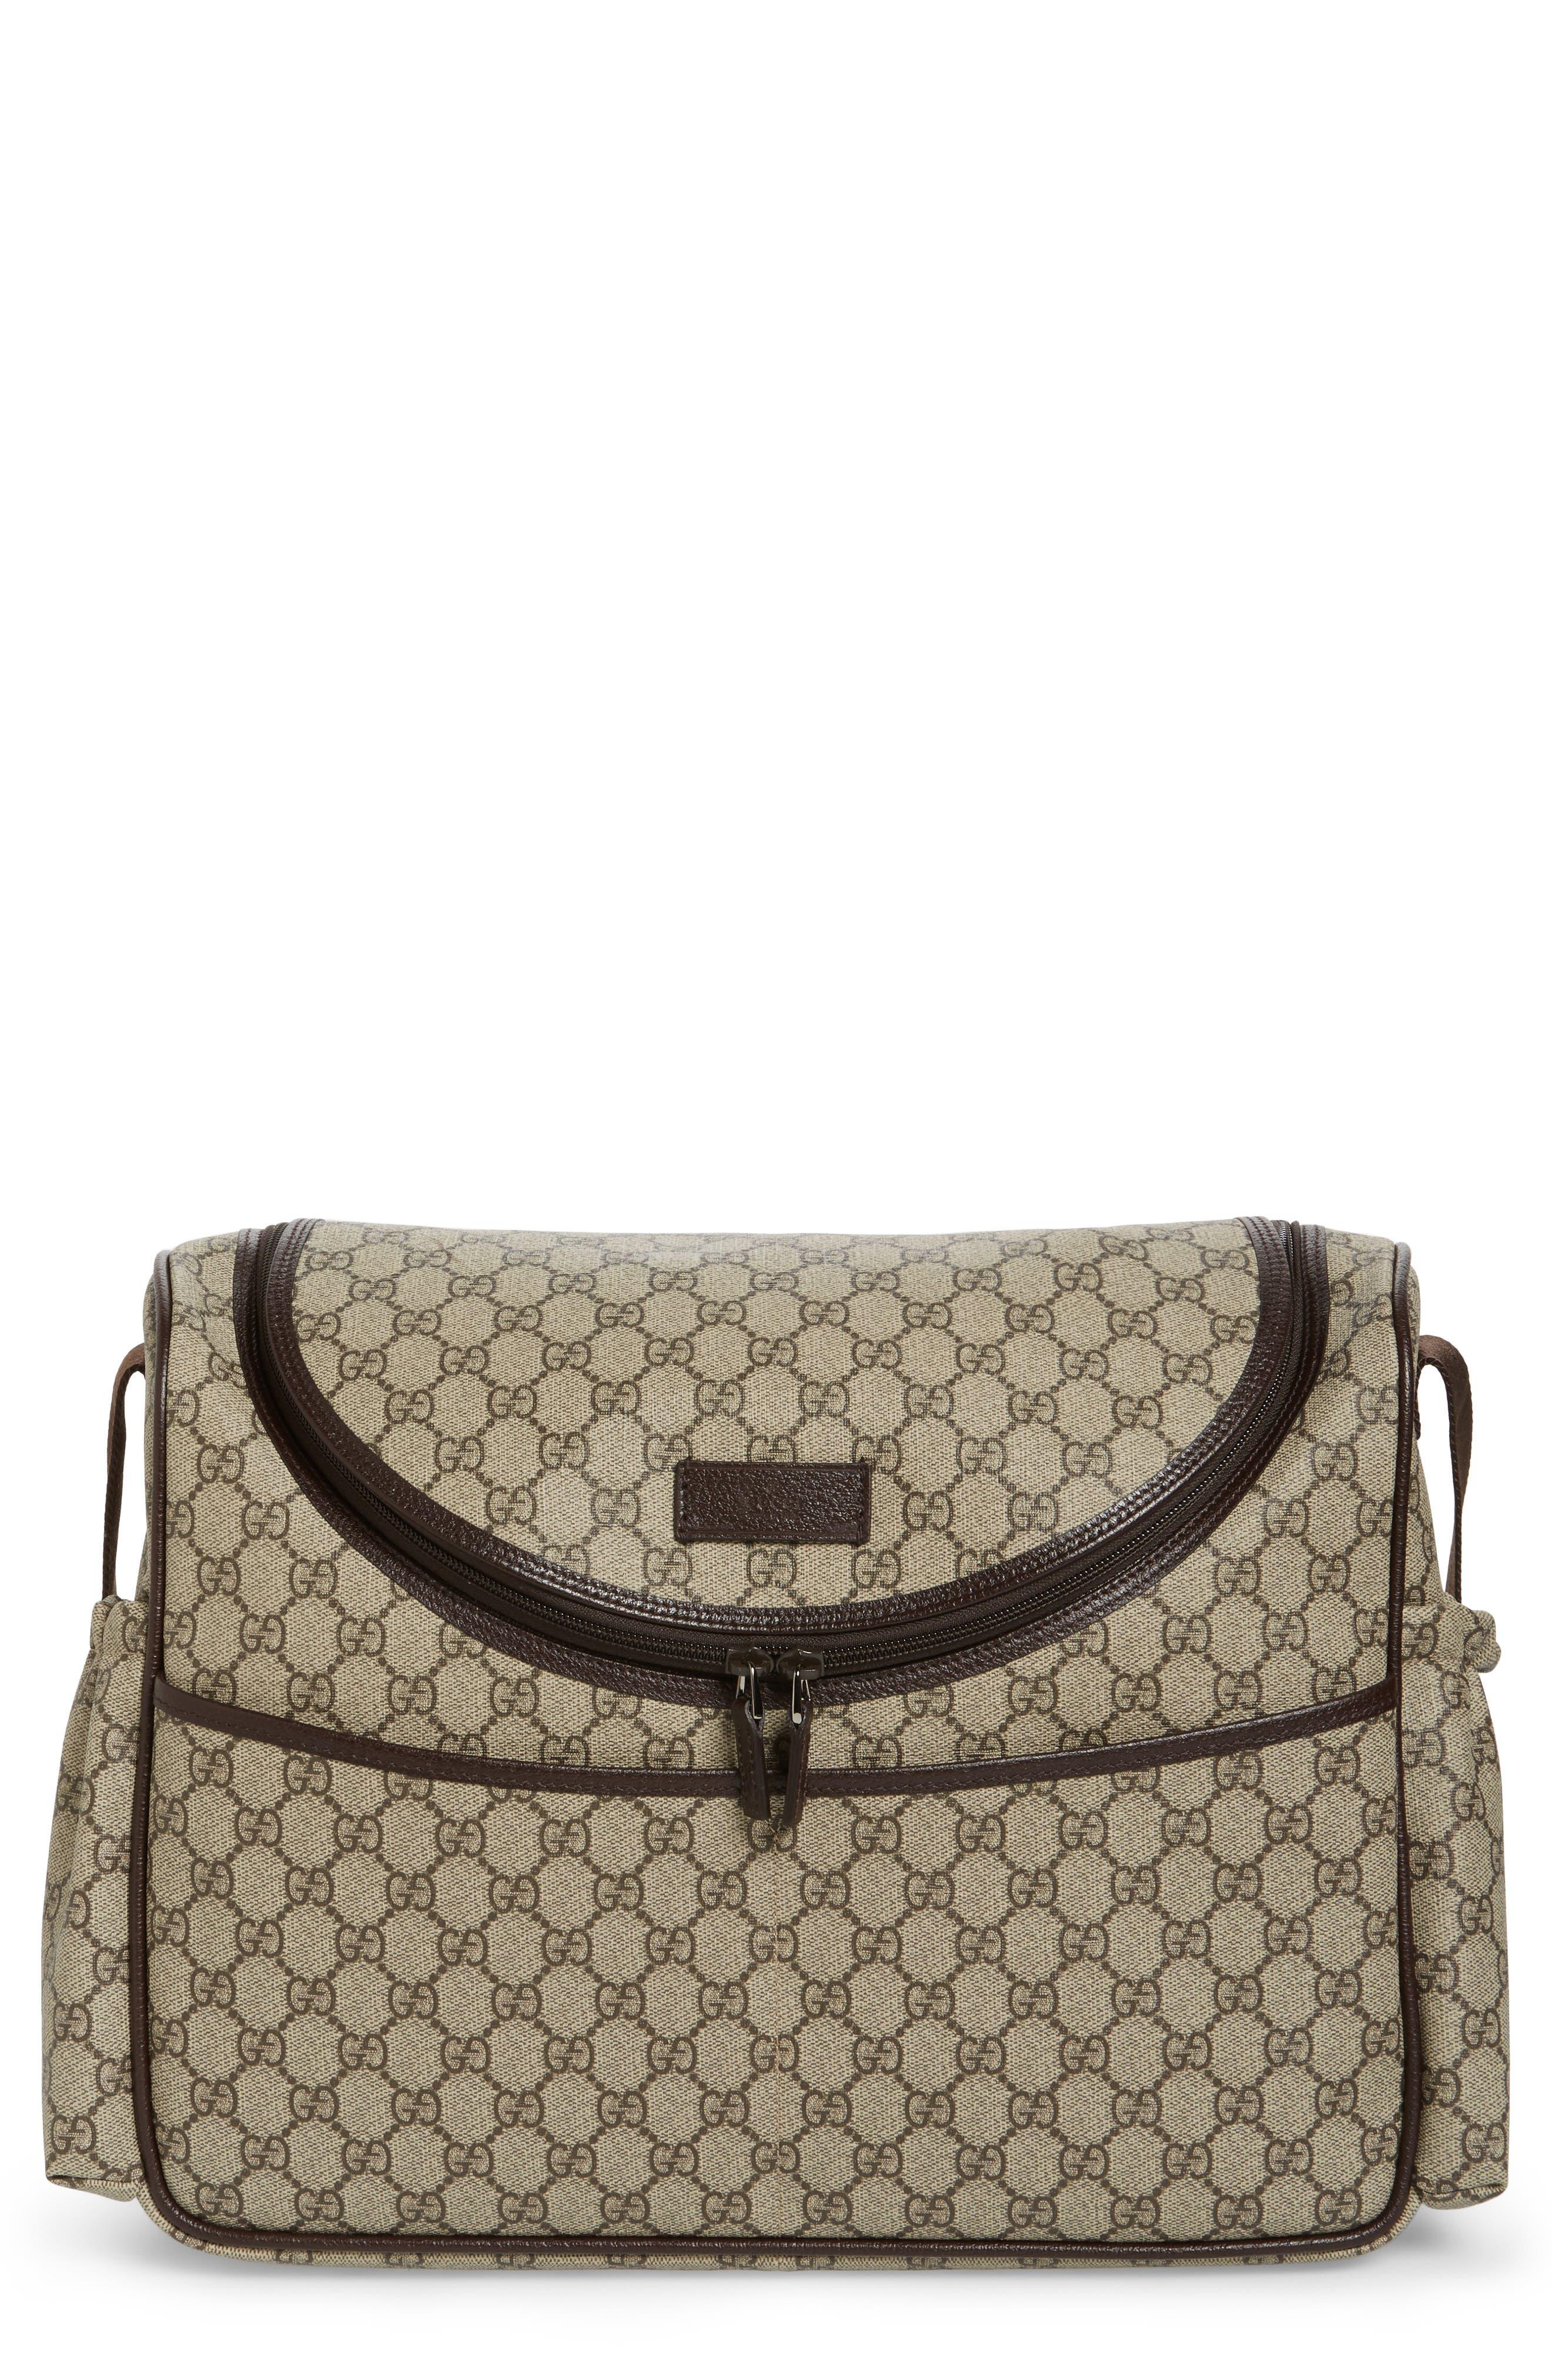 Gucci Double G Logo Diaper Bag